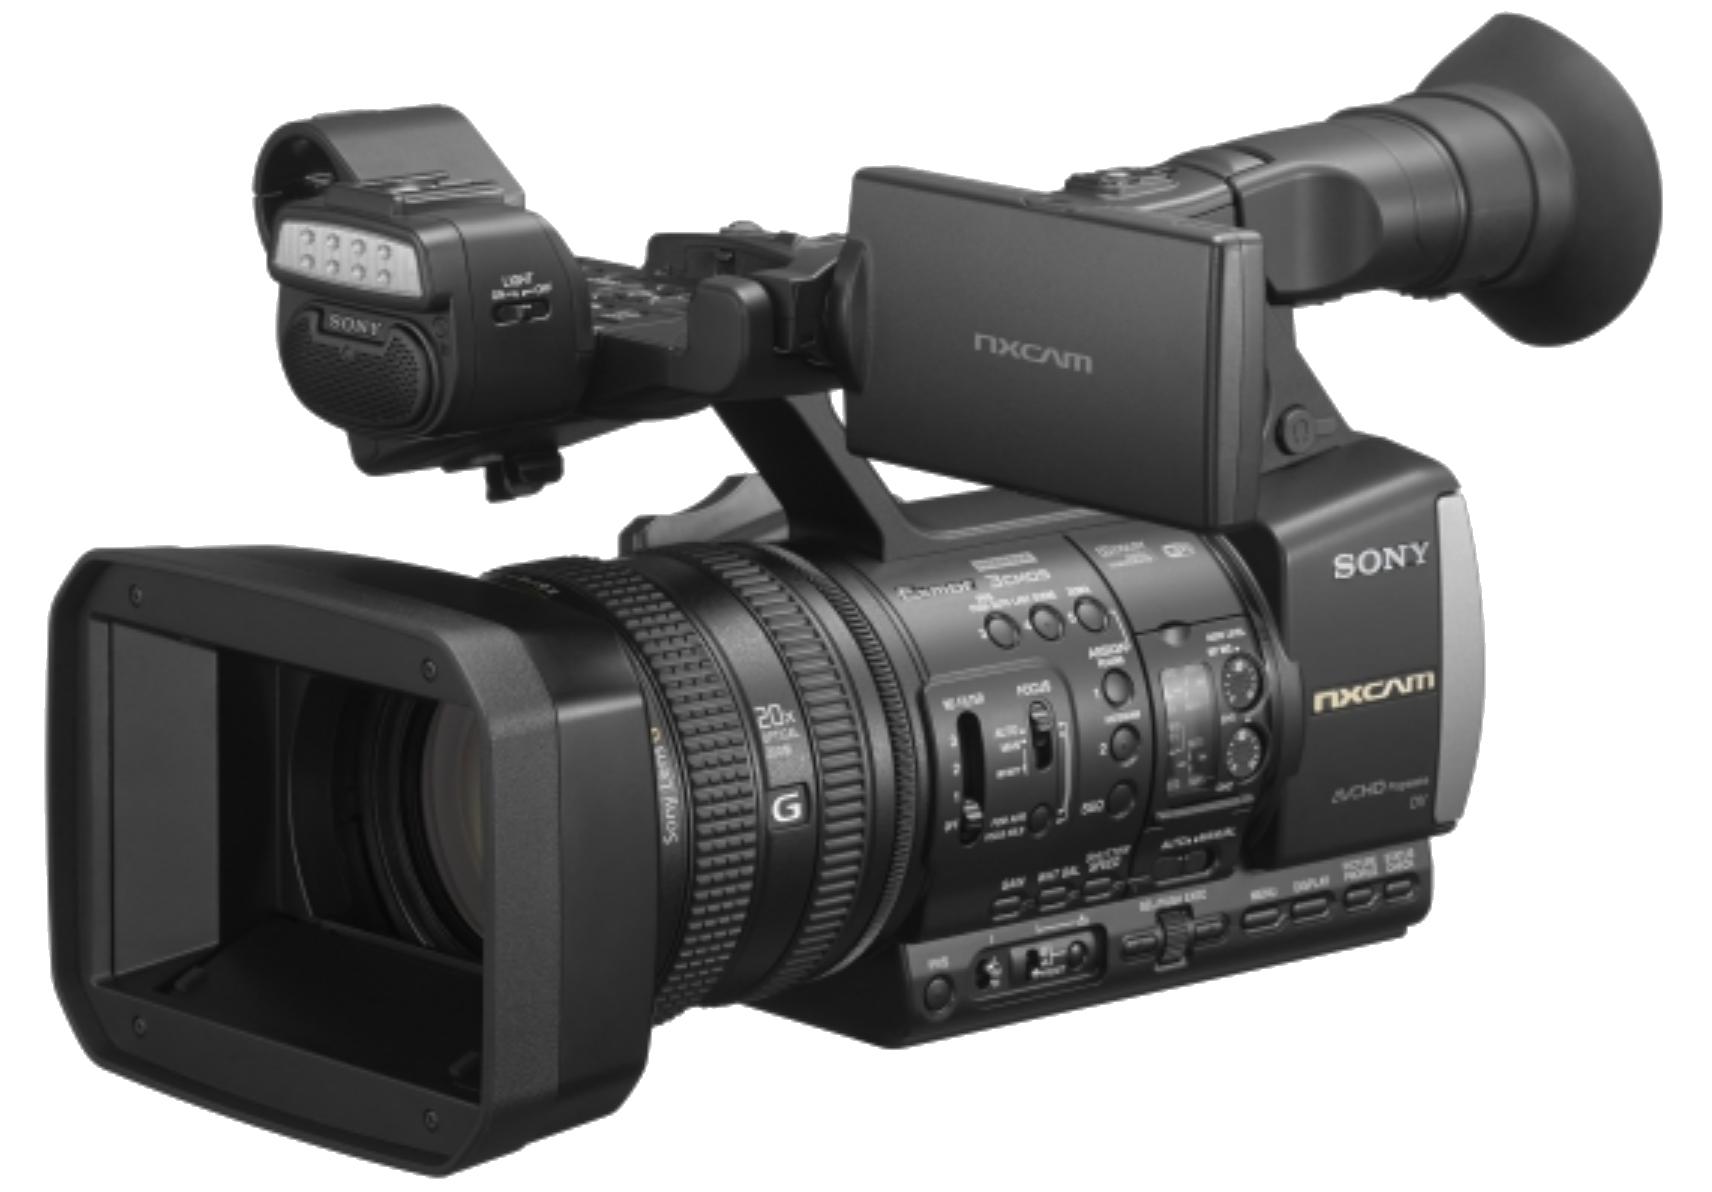 Download Digital Video Camera PNG Transparent Image 128.